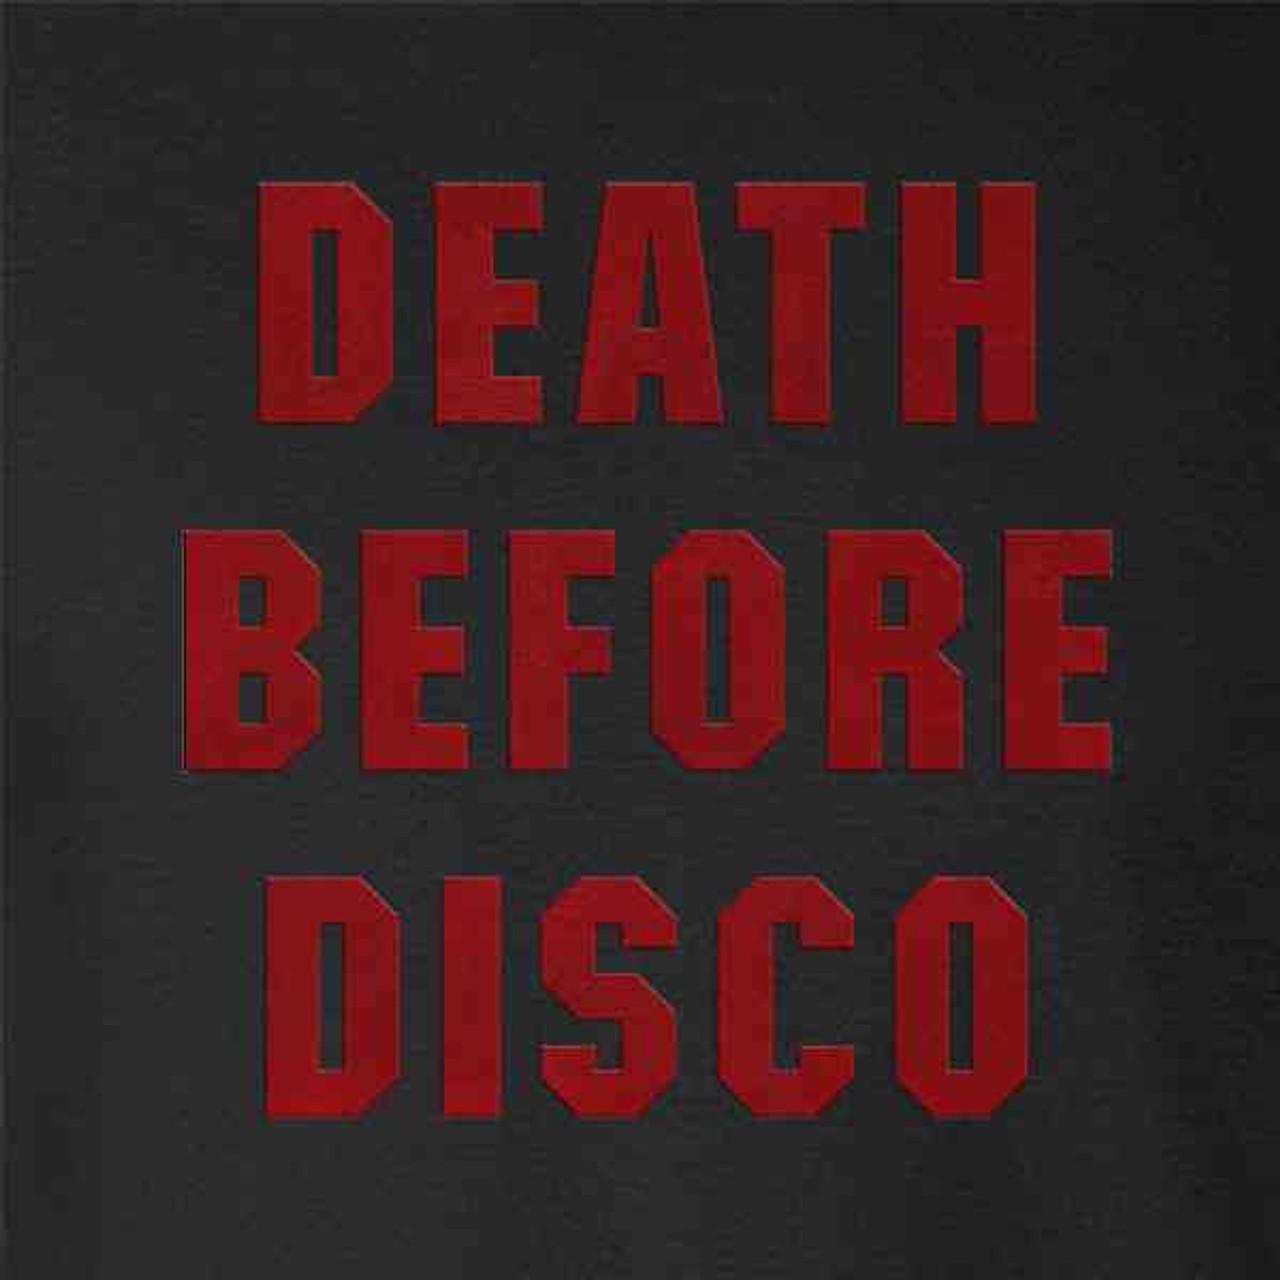 Death Before Disco Retro Halloween Costume Pop Threads